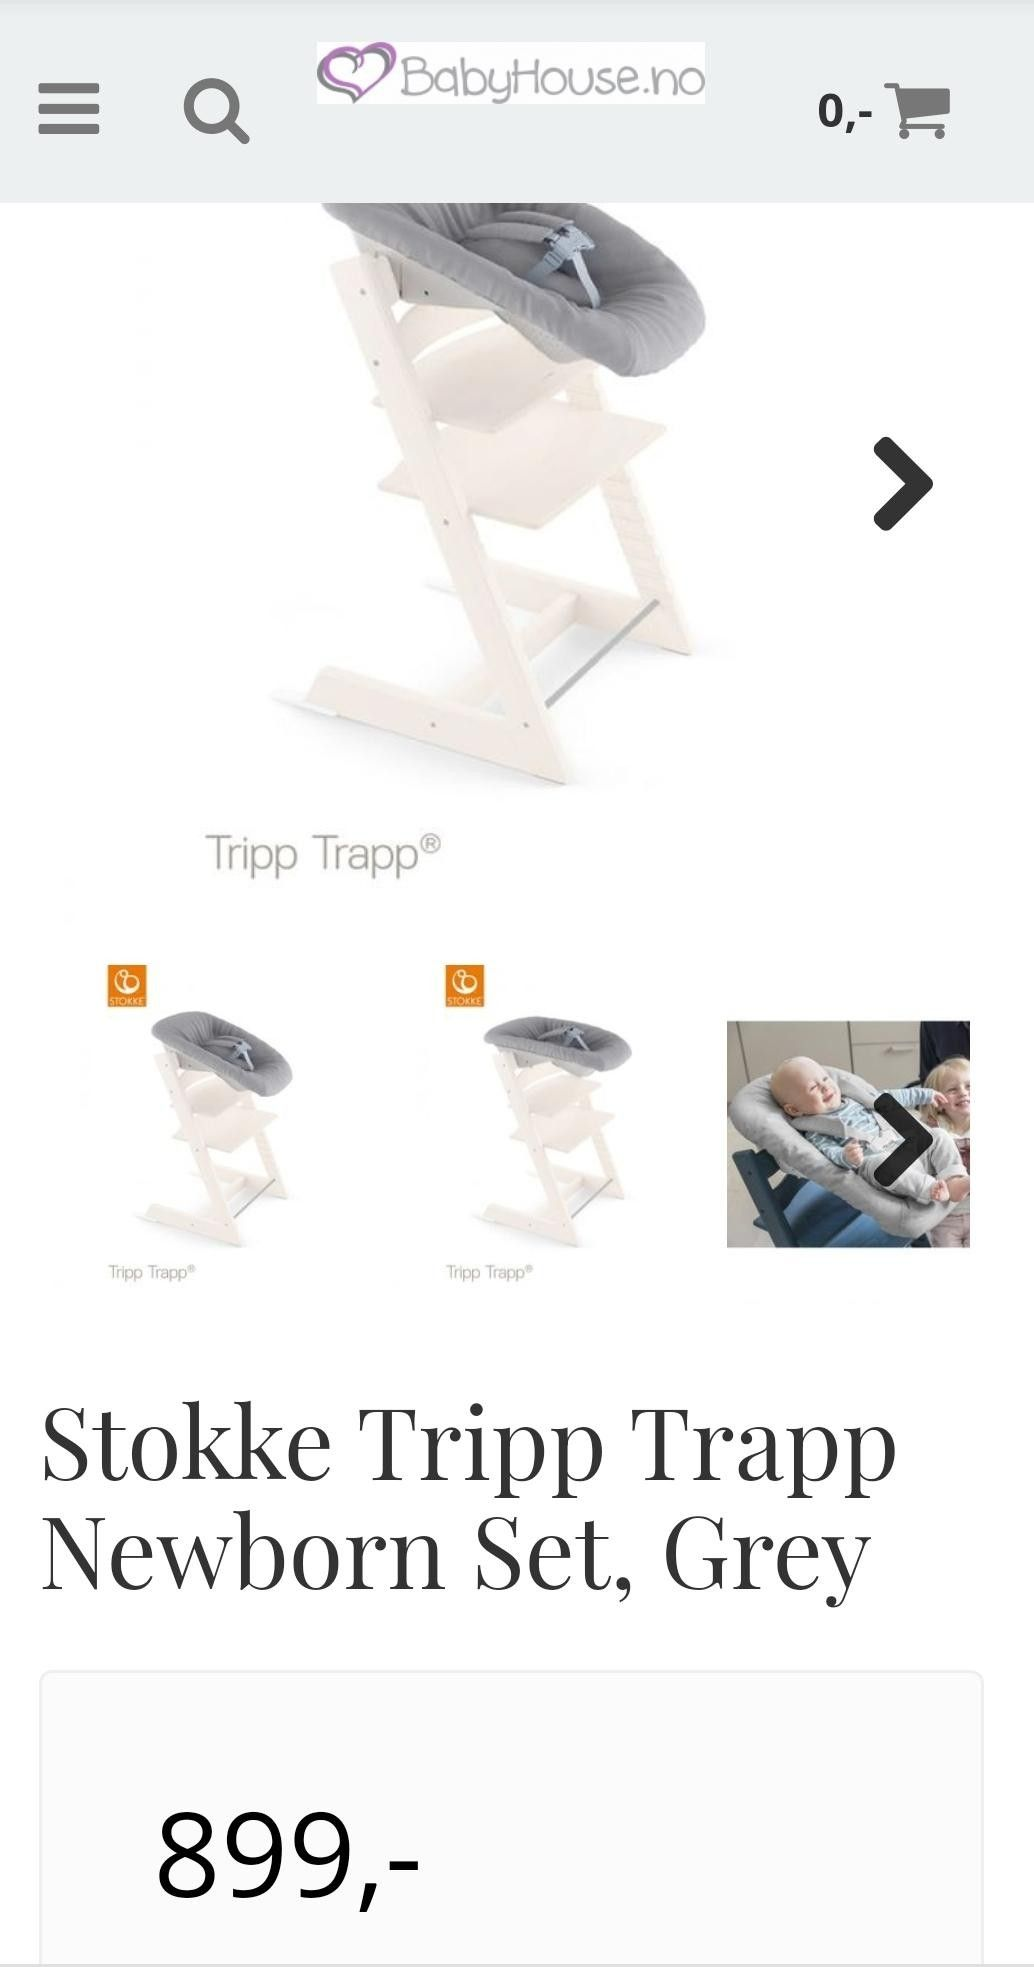 Stokke Tripp Trapp Stol, Hvit Babyhouse